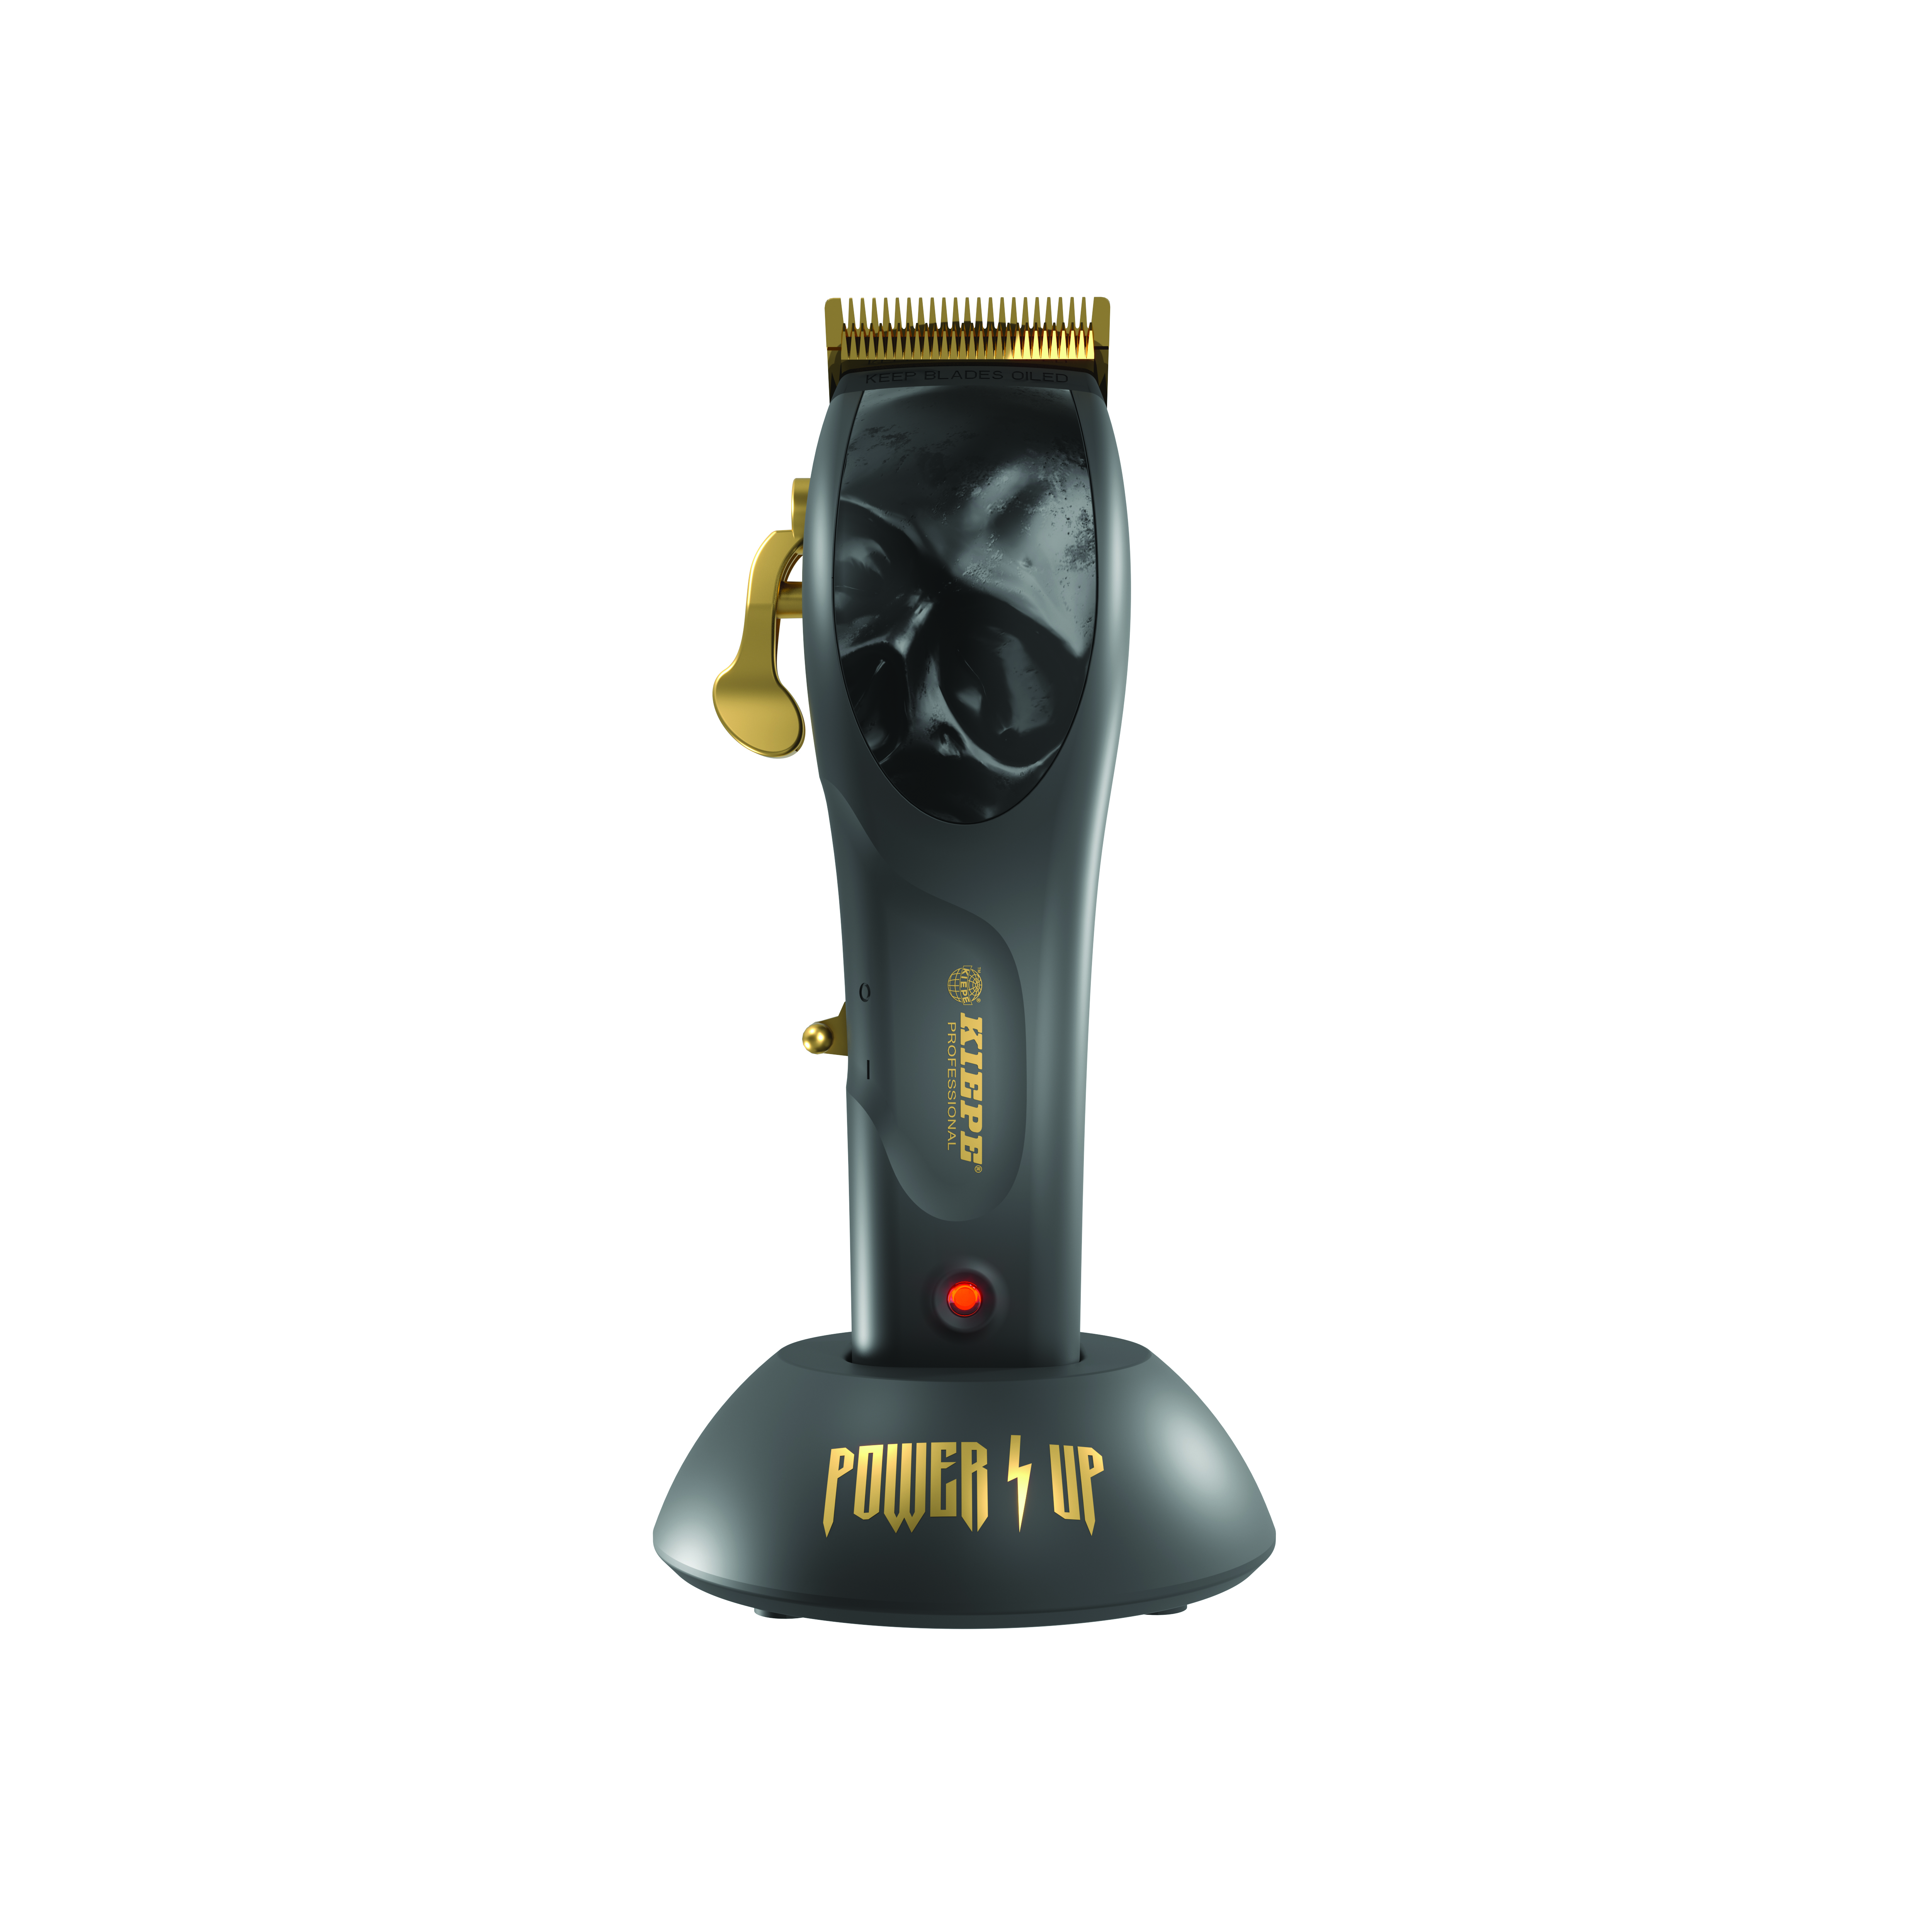 KIEPE Power Up Hair Clipper 6338 - profesionální akumulátorový stříhací strojek + stlačený vzduch, 400 ml